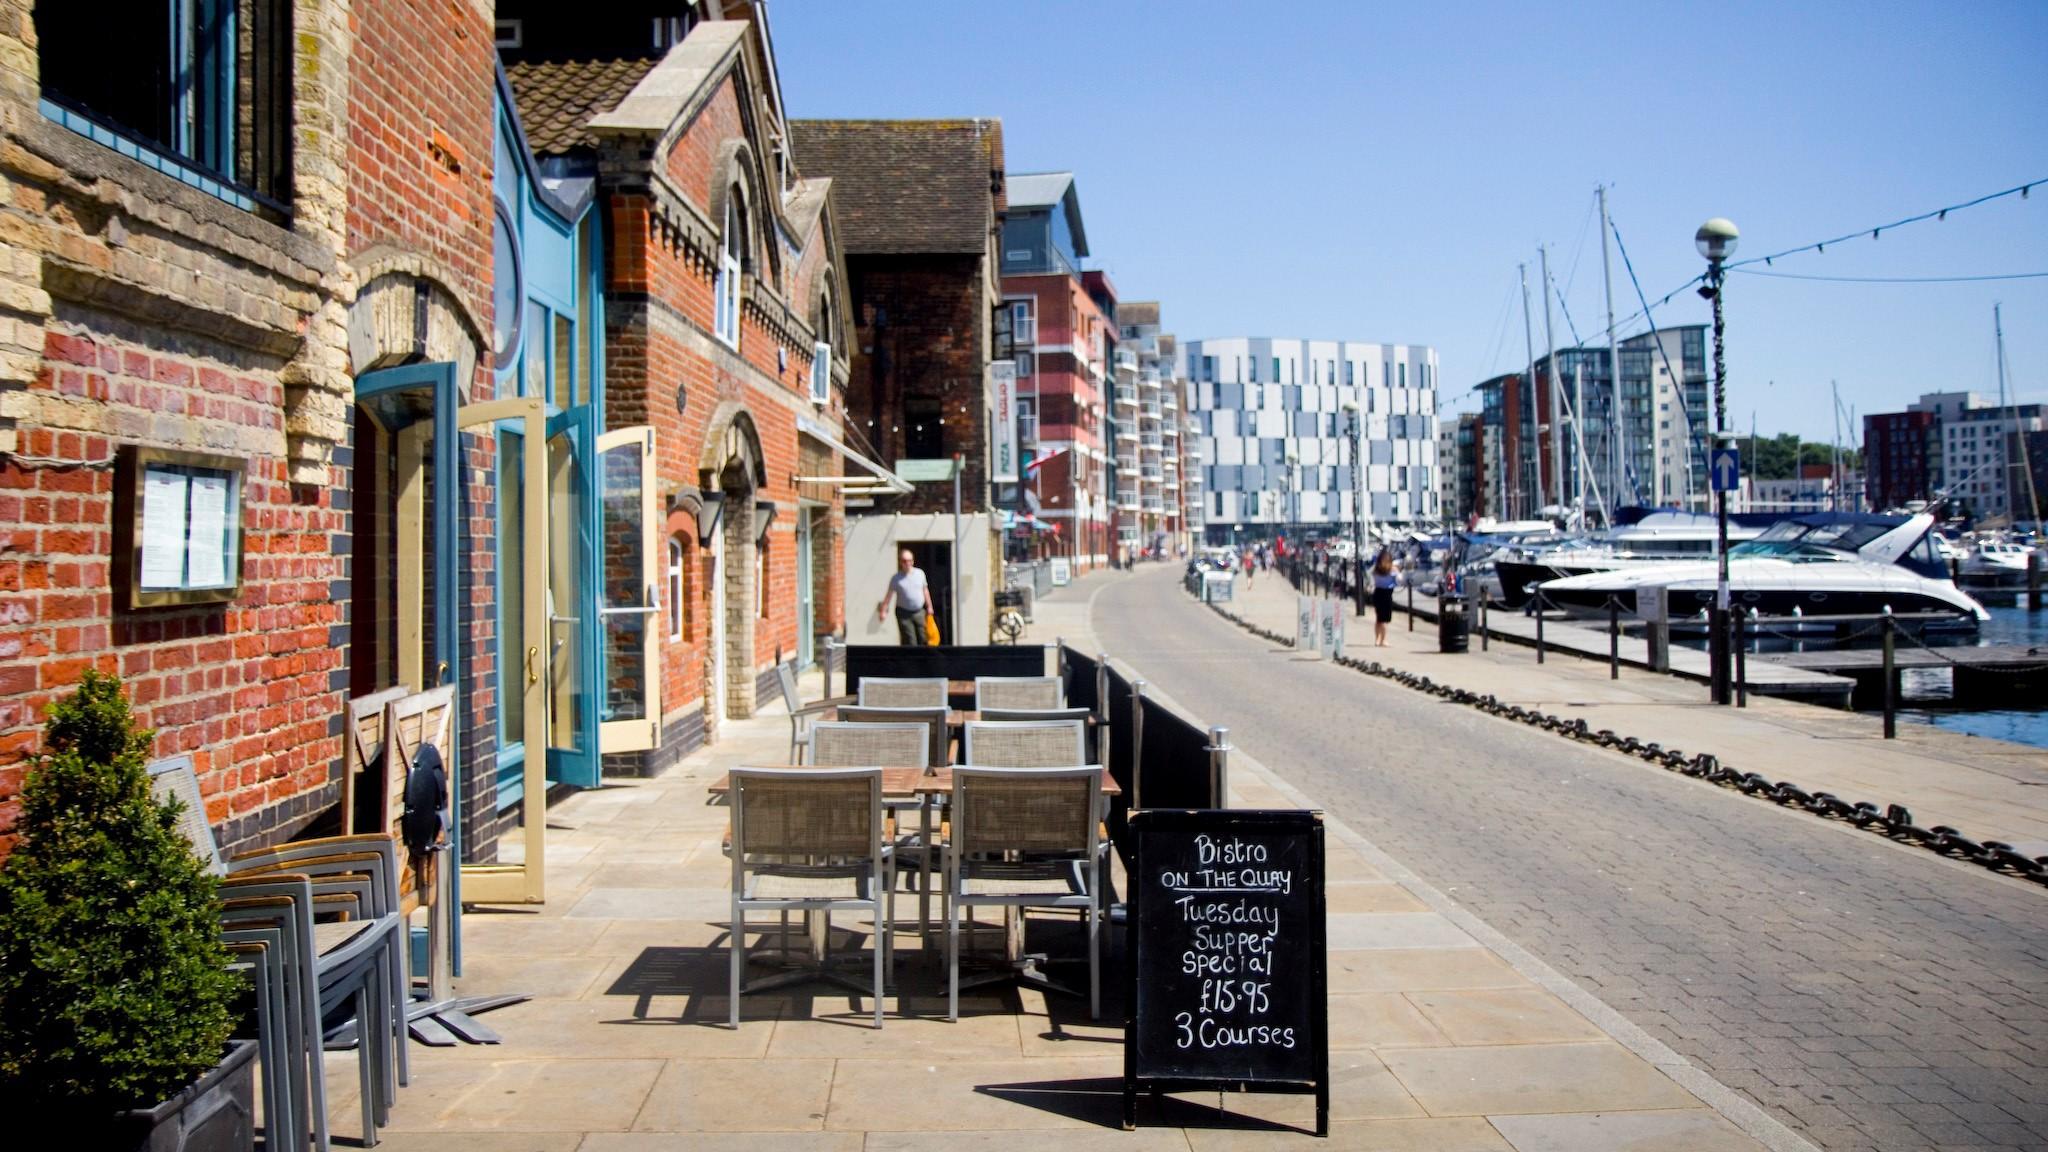 University of Suffolk making bright start in Ipswich | Wonkhe